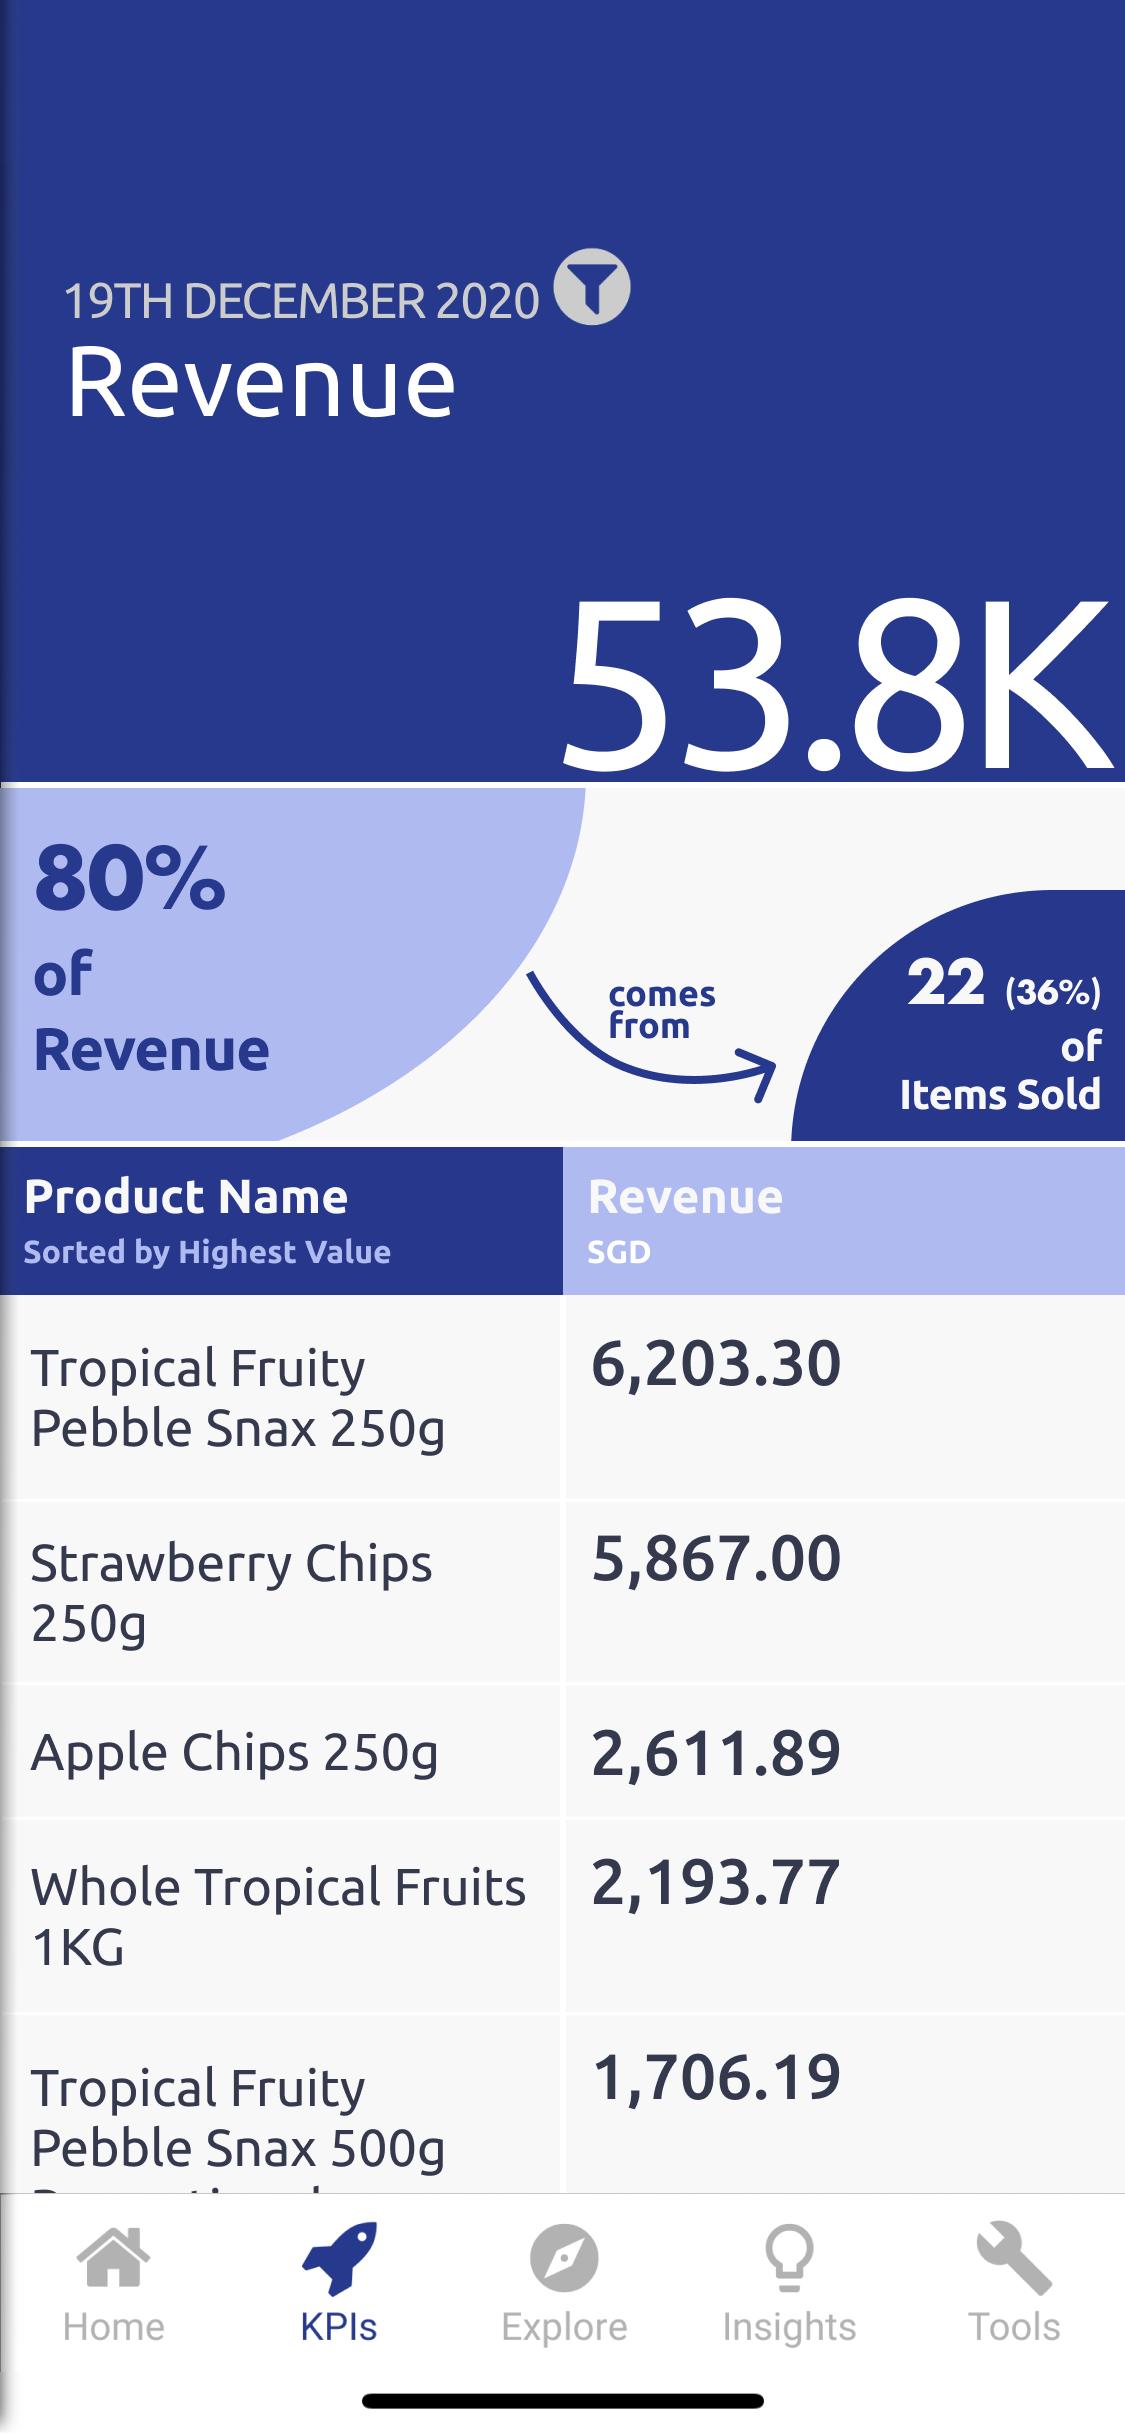 screenshot of Konigle revenue KPI for online business